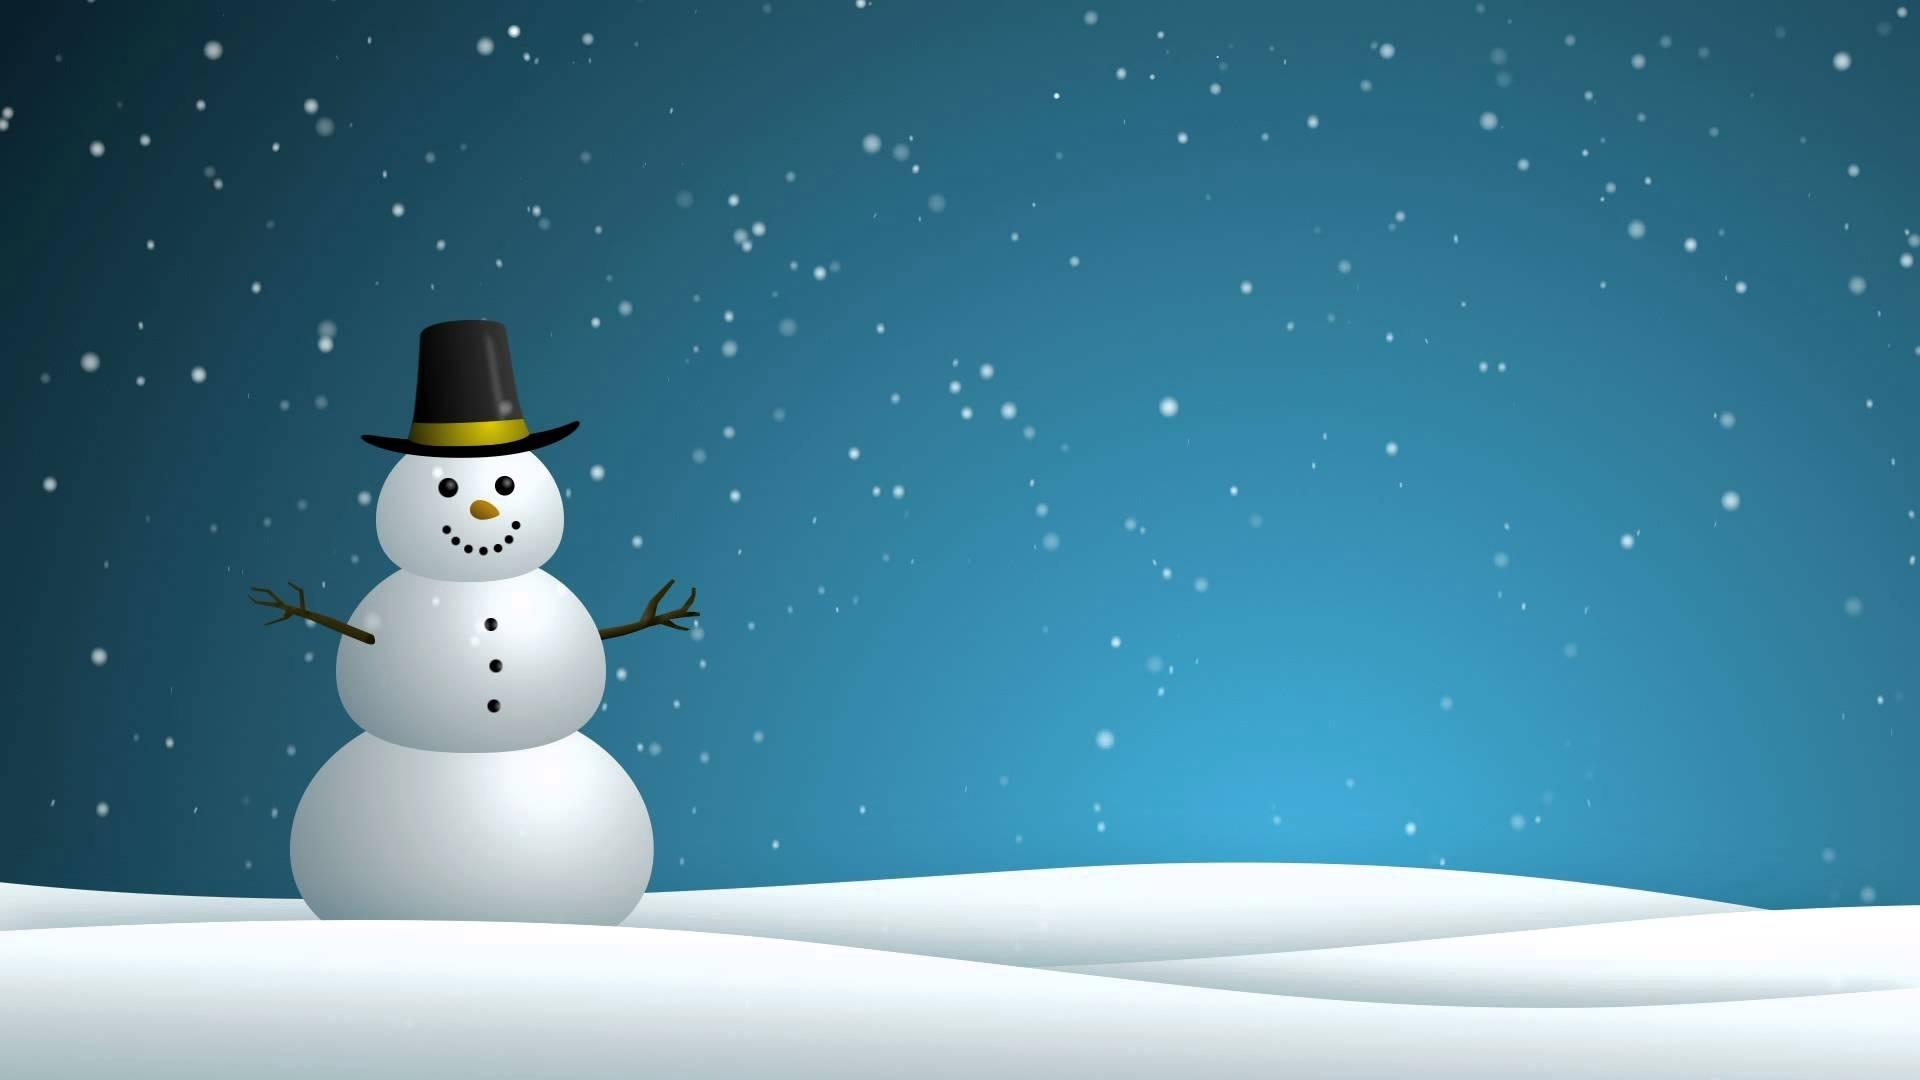 snowman - hd background loop - youtube